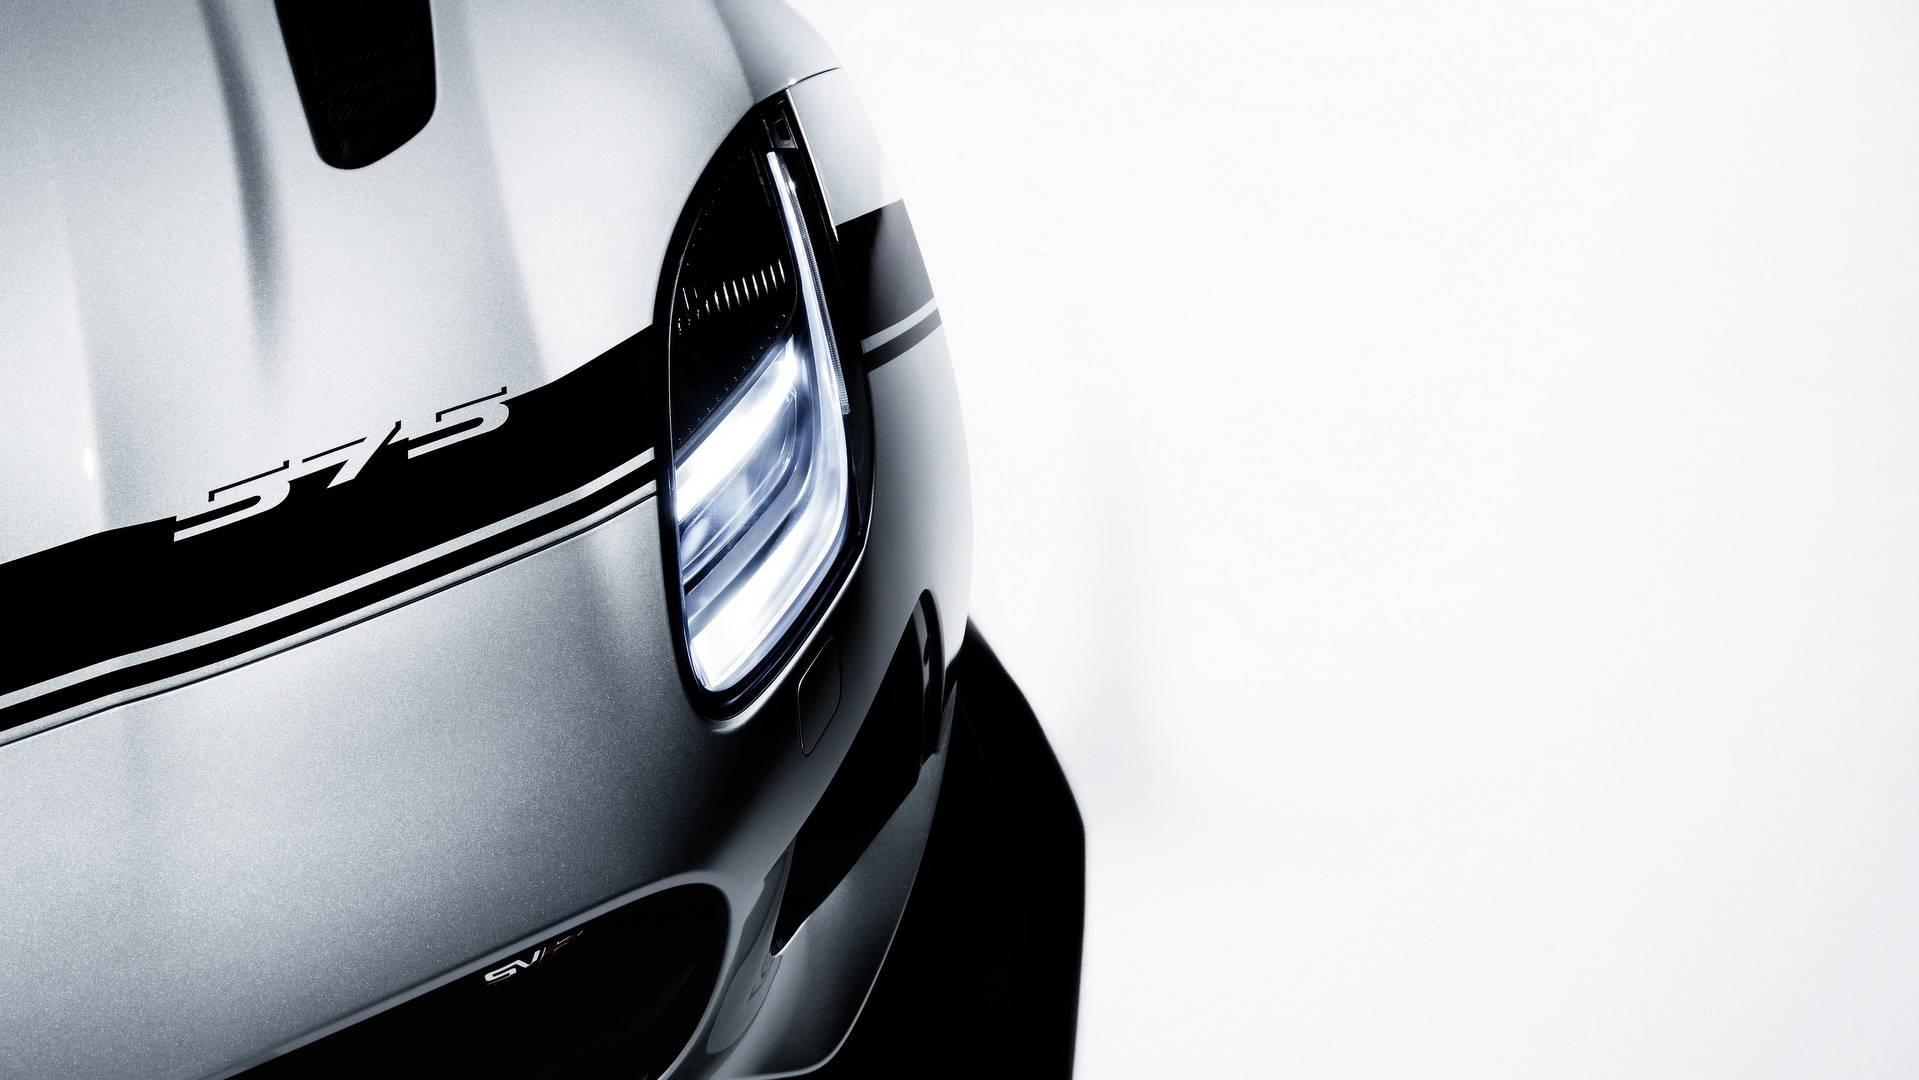 Jaguar_F-Type_SVR_with_Graphic_Pack_03